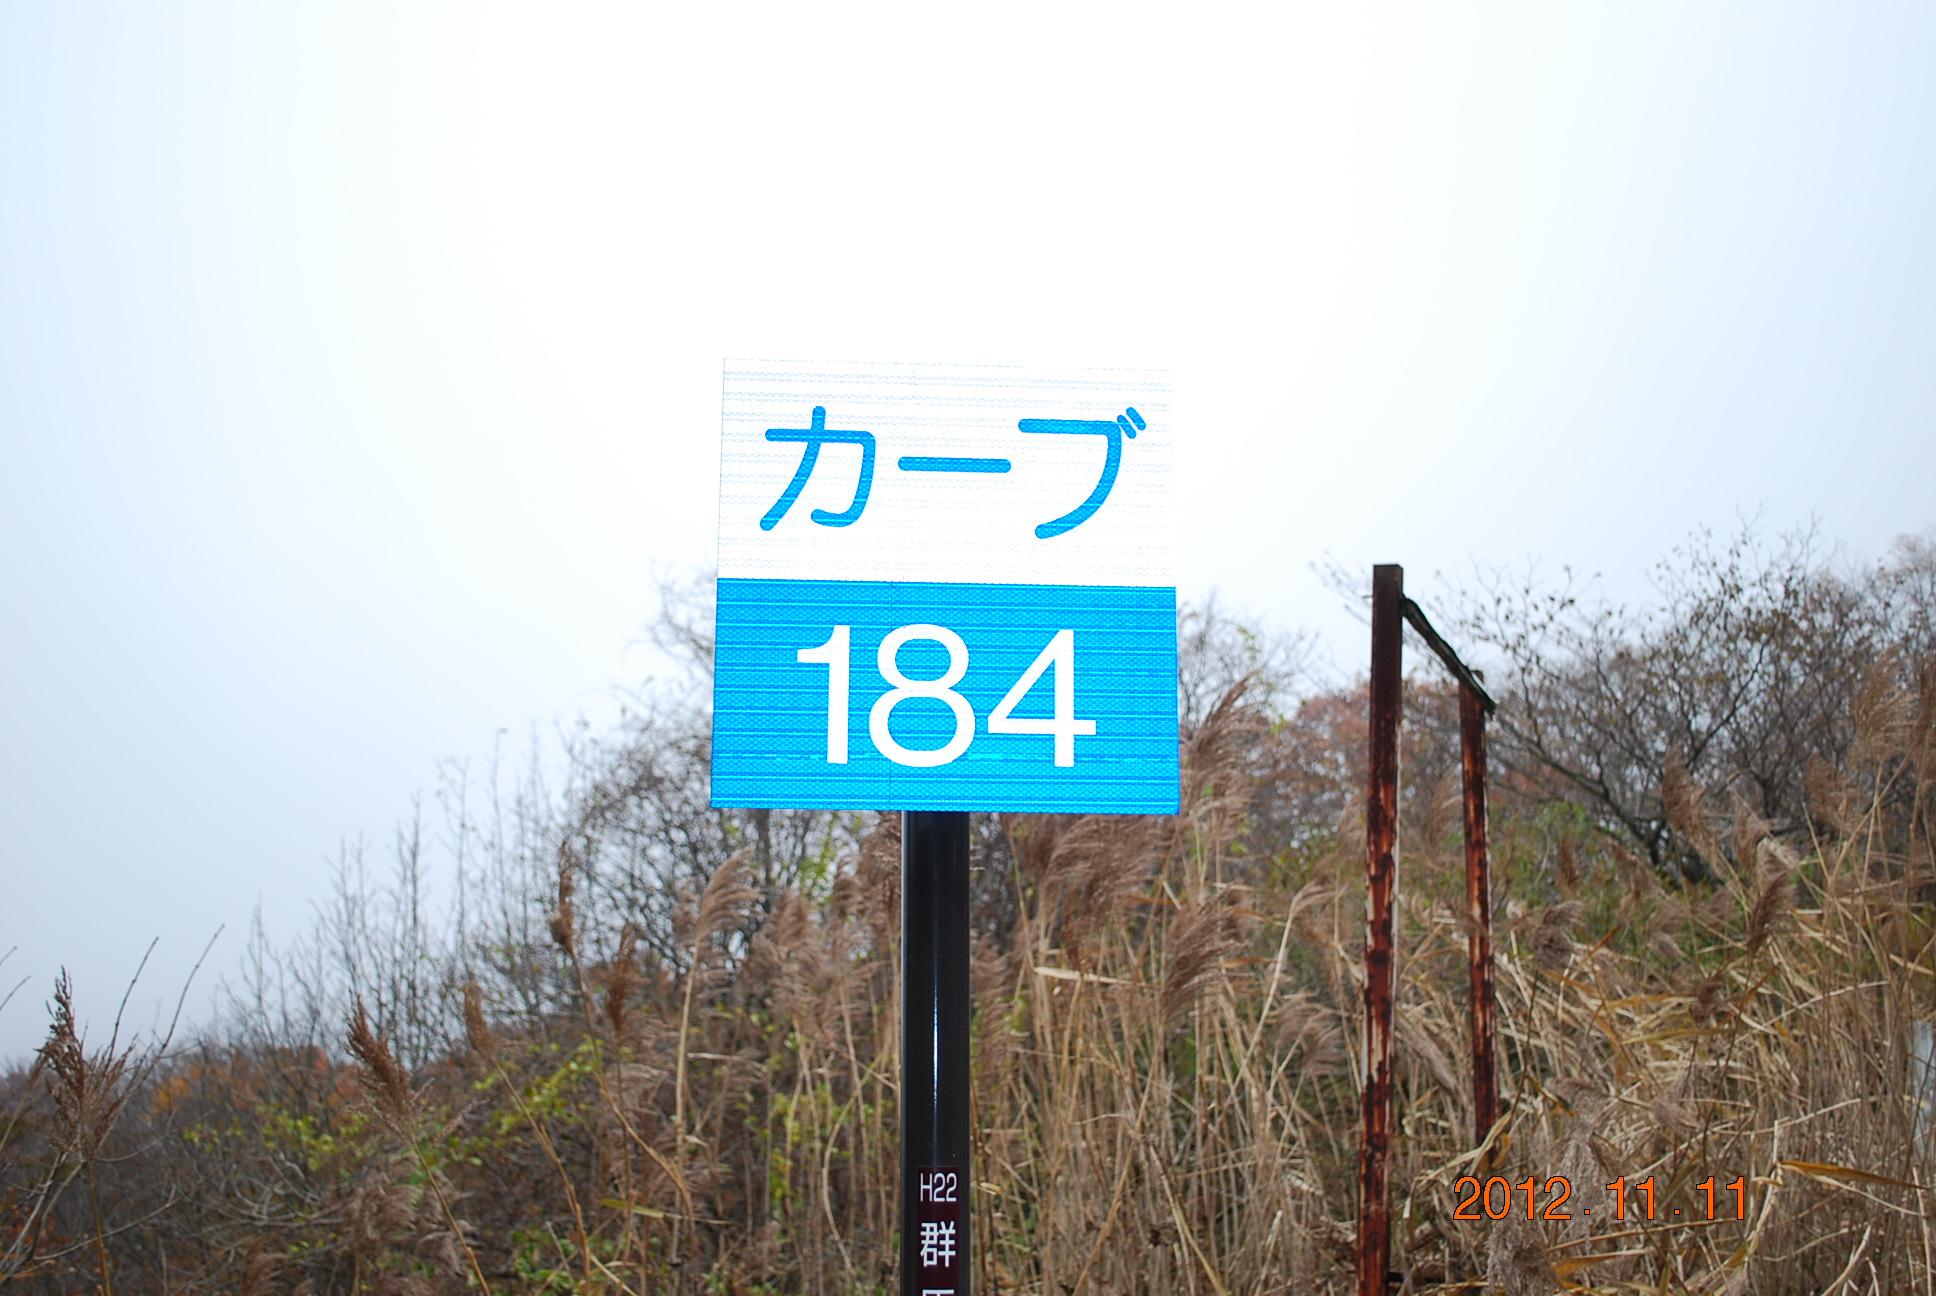 2012_1111_125937-DSC_1302.jpg